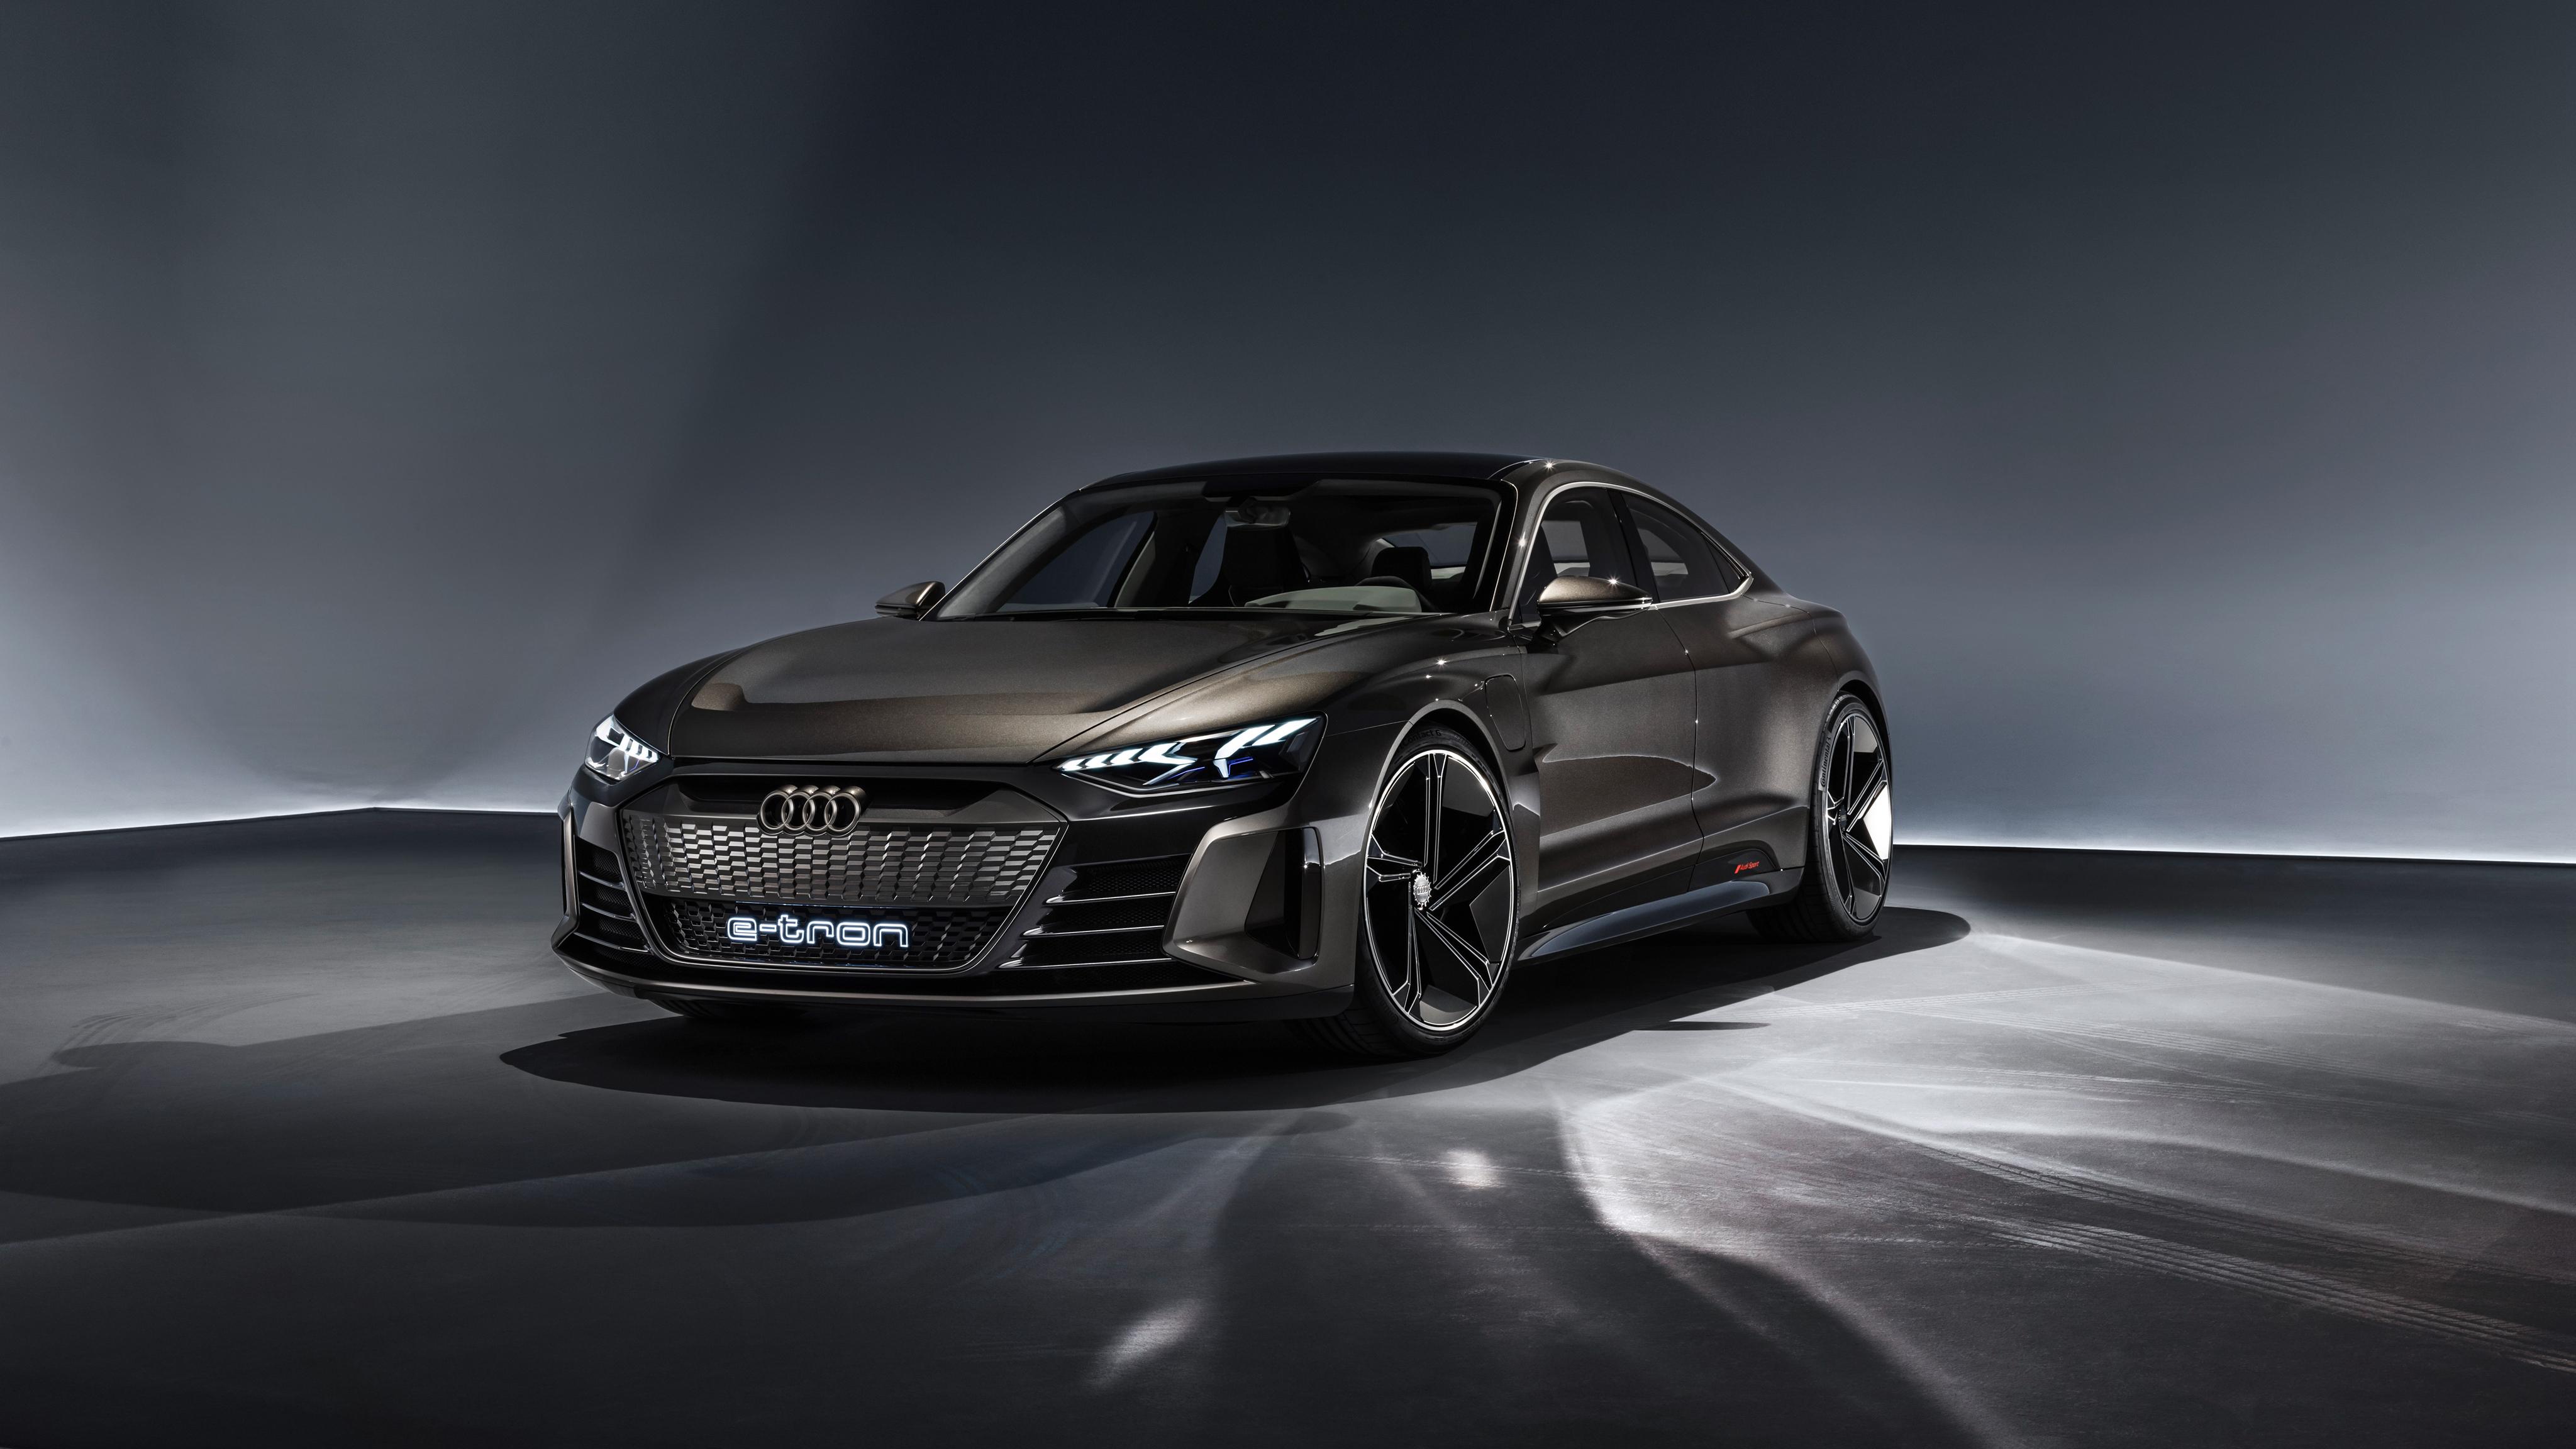 Audi E Tron Gt Wallpapers 4k 4096x2304 Wallpaper Teahub Io